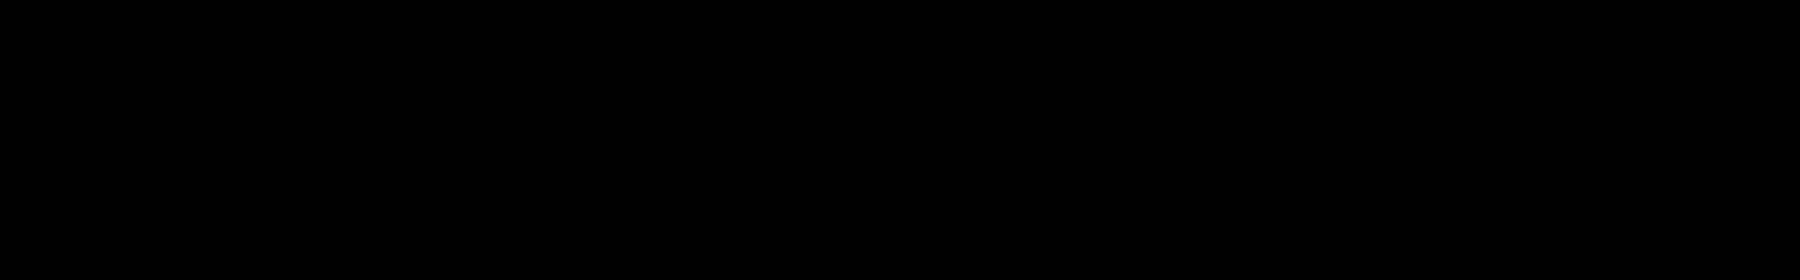 TECHNO POISON audio waveform